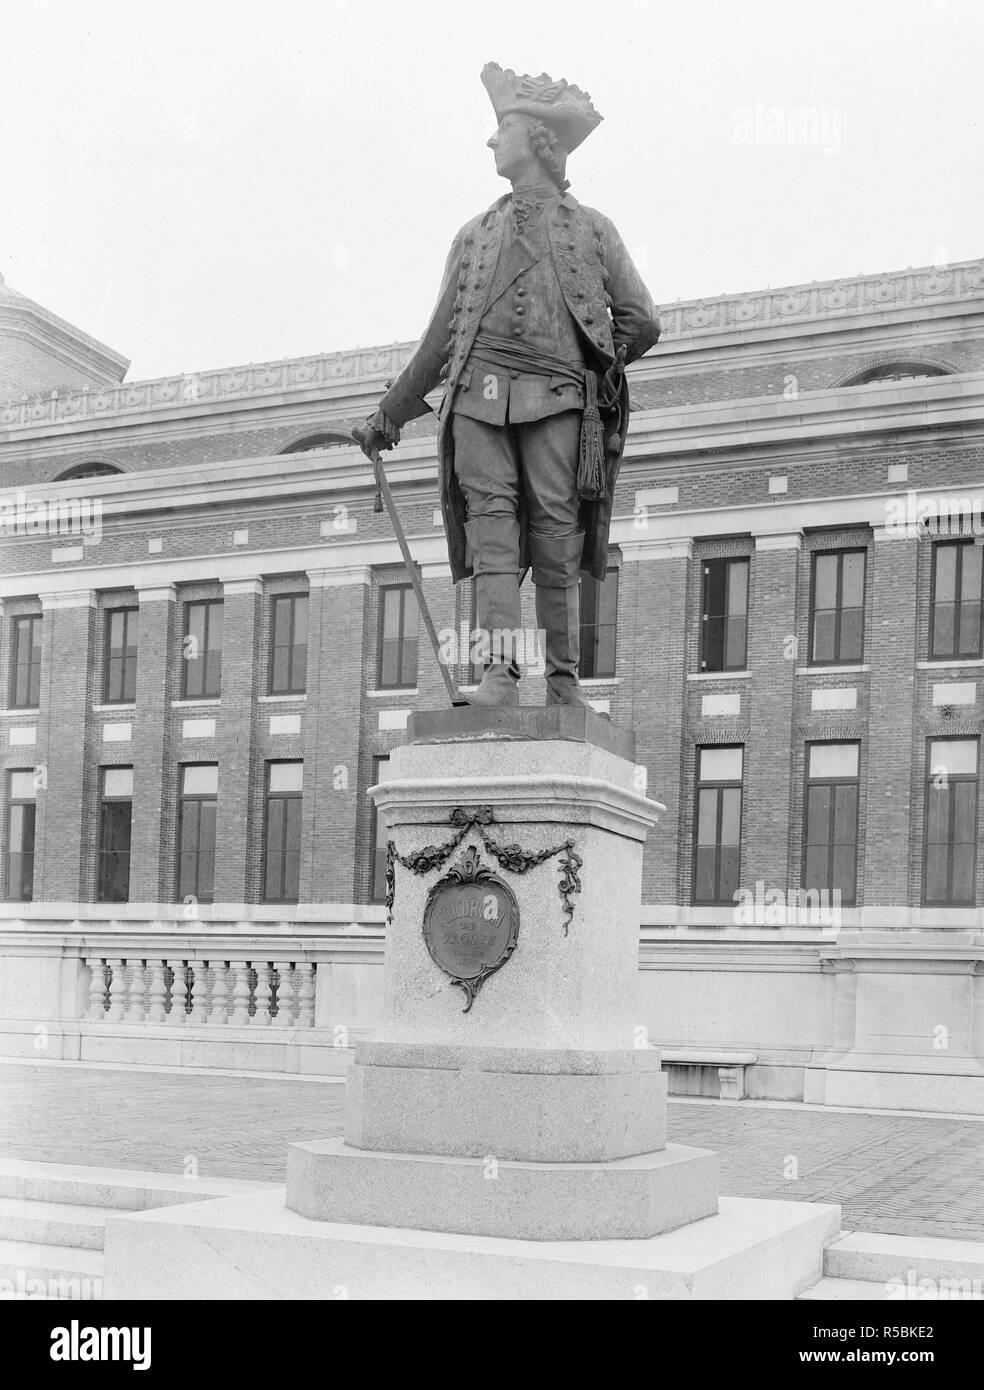 Statue: Frederich der Grosse, 1740-1786 (photo ca. 1910-1920) - Stock Image